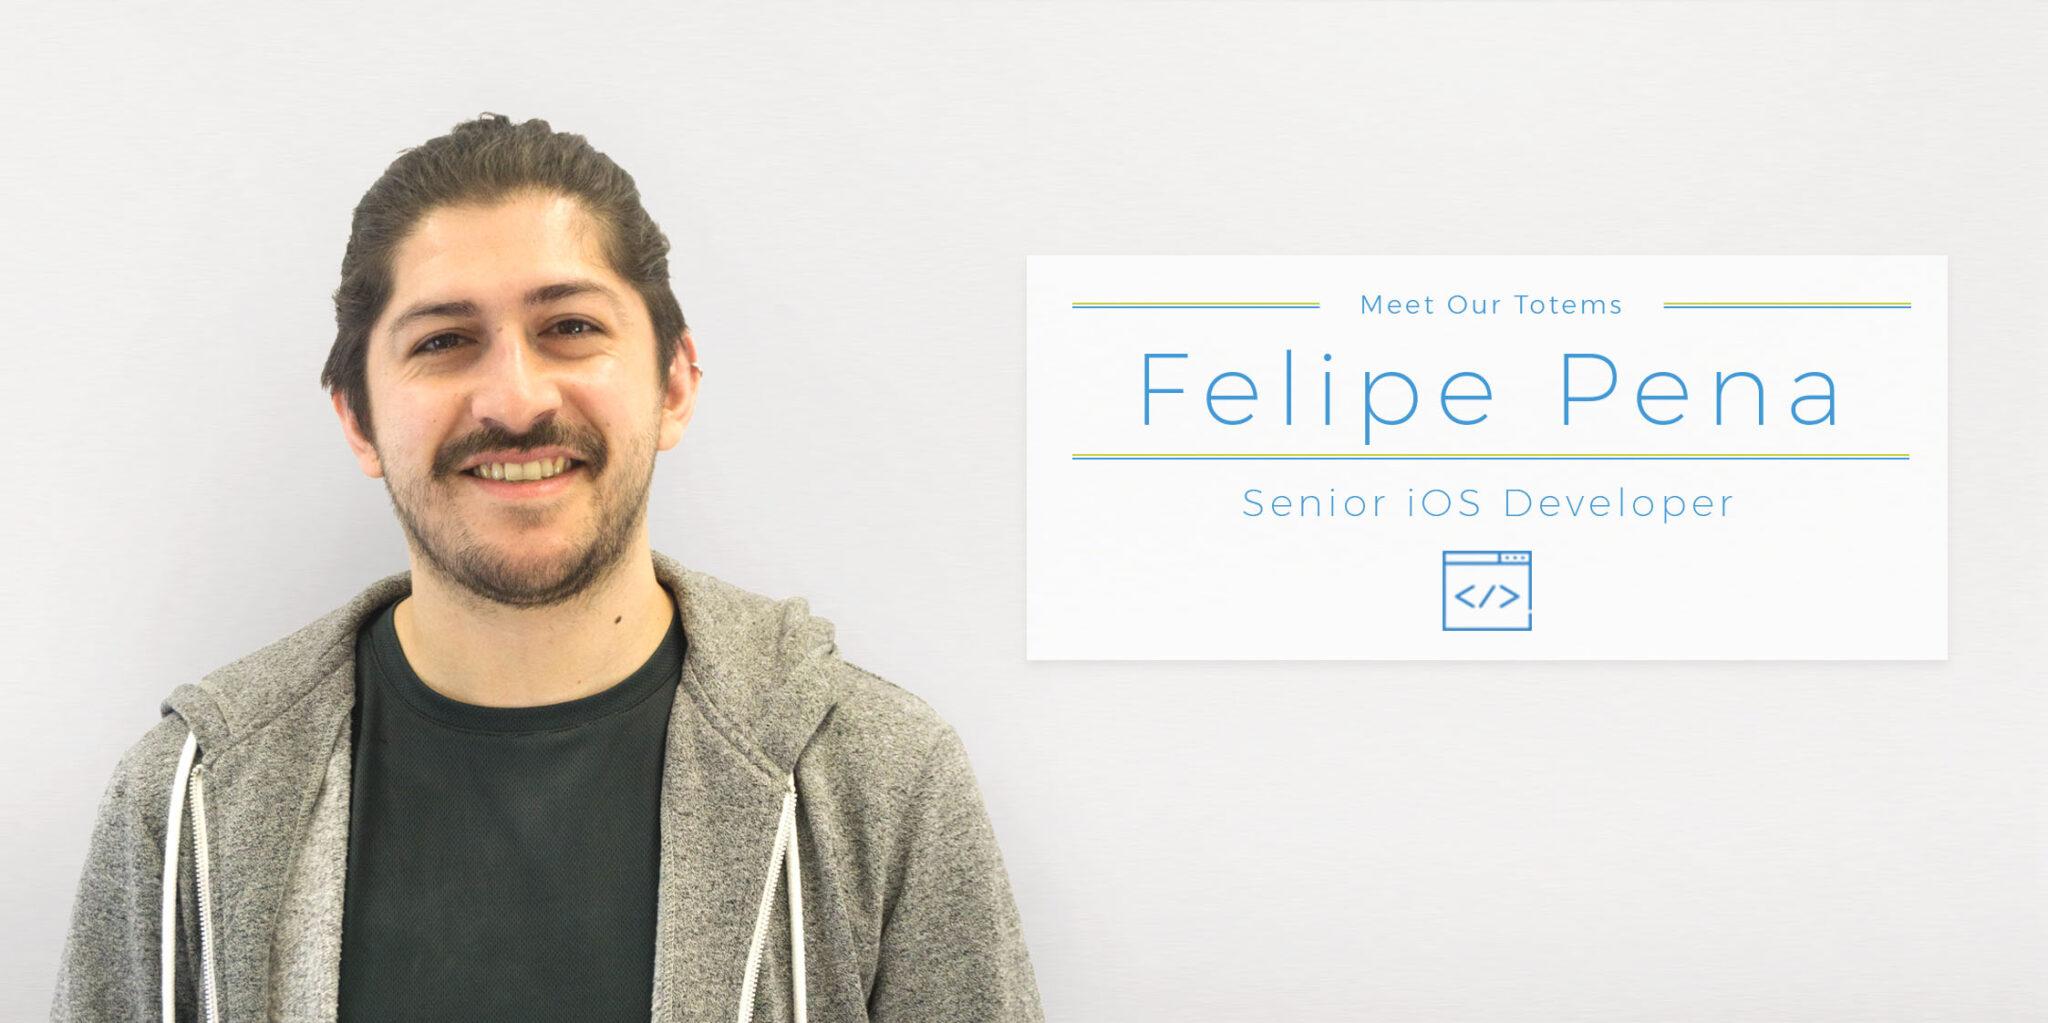 Meet Our Totems – Felipe